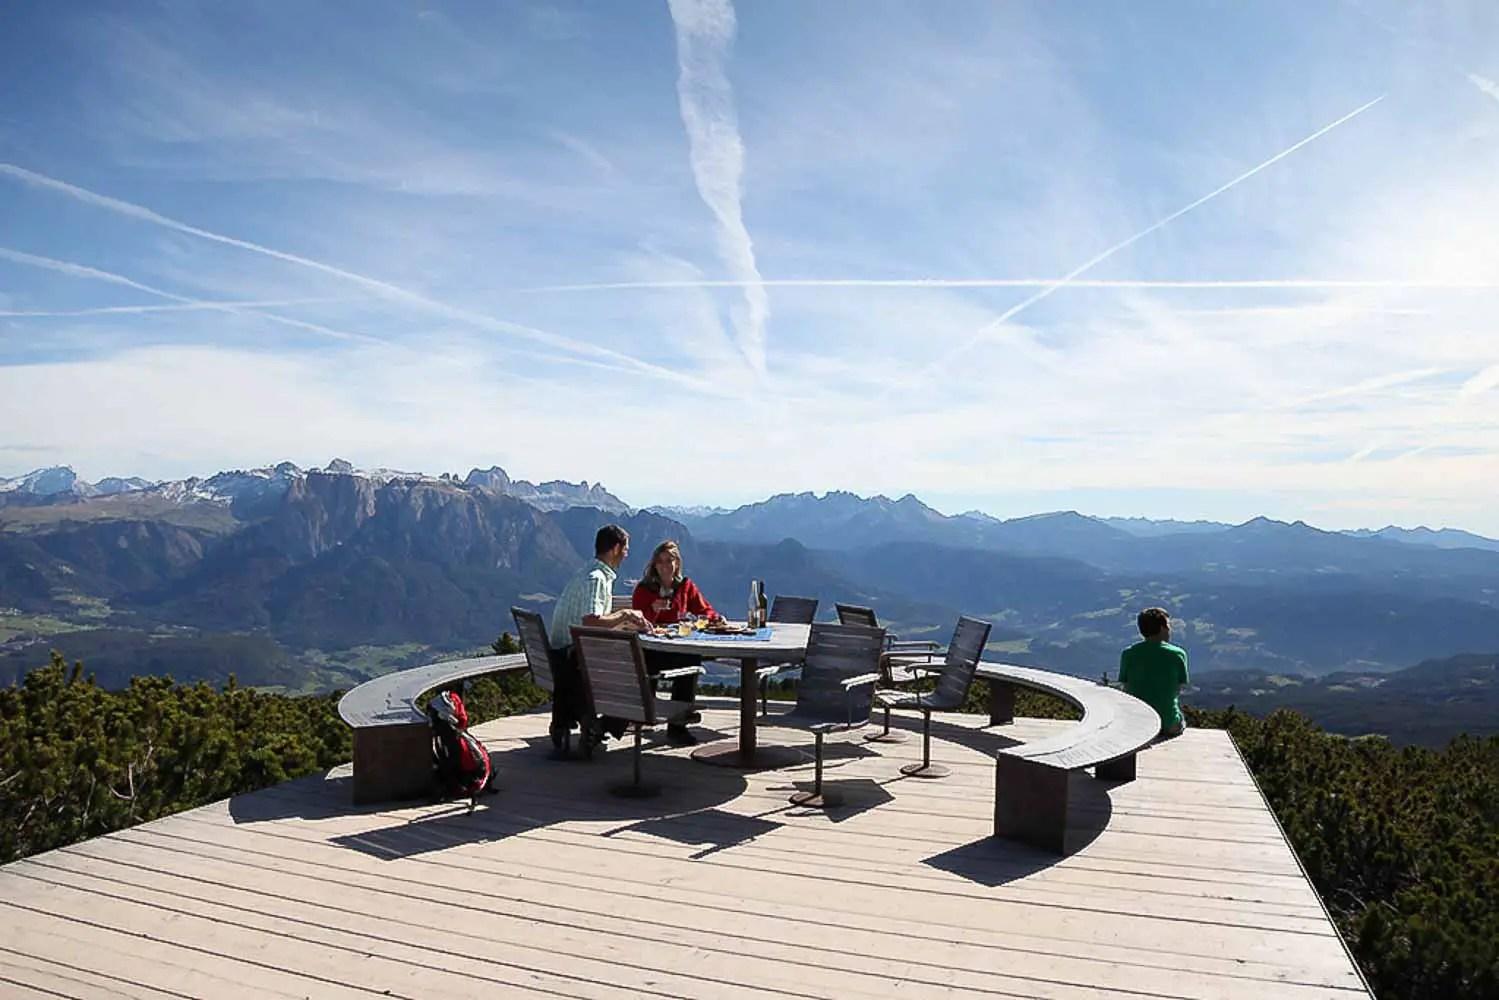 Overlooking the mountains and valley in Klobenstein - Tirol, Italy